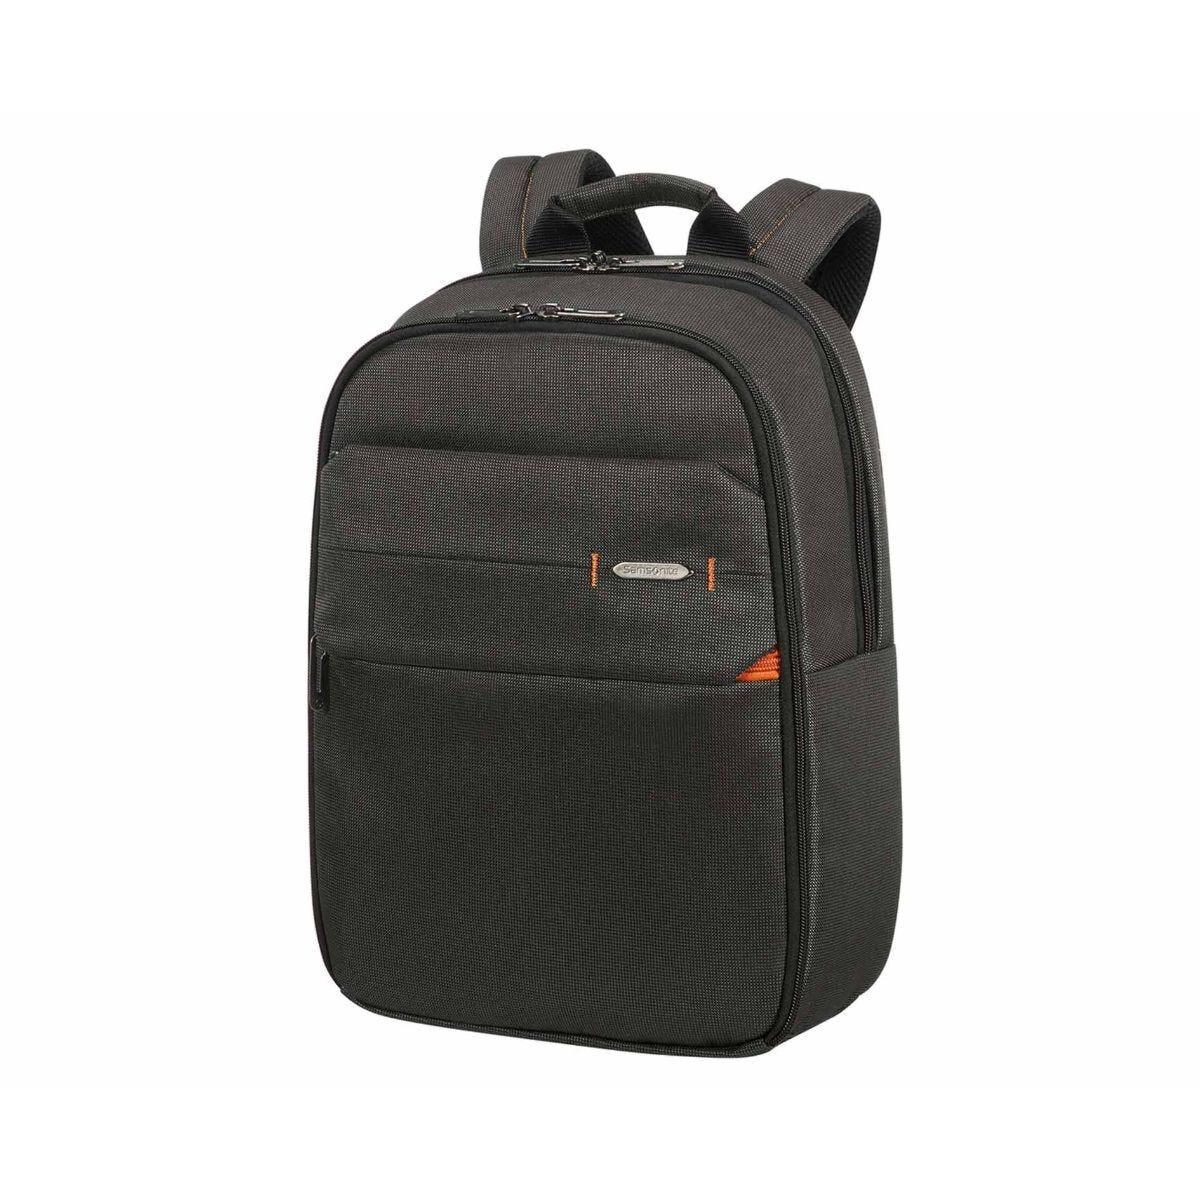 Samsonite Network 3 Laptop Backpack 14.1 Inch